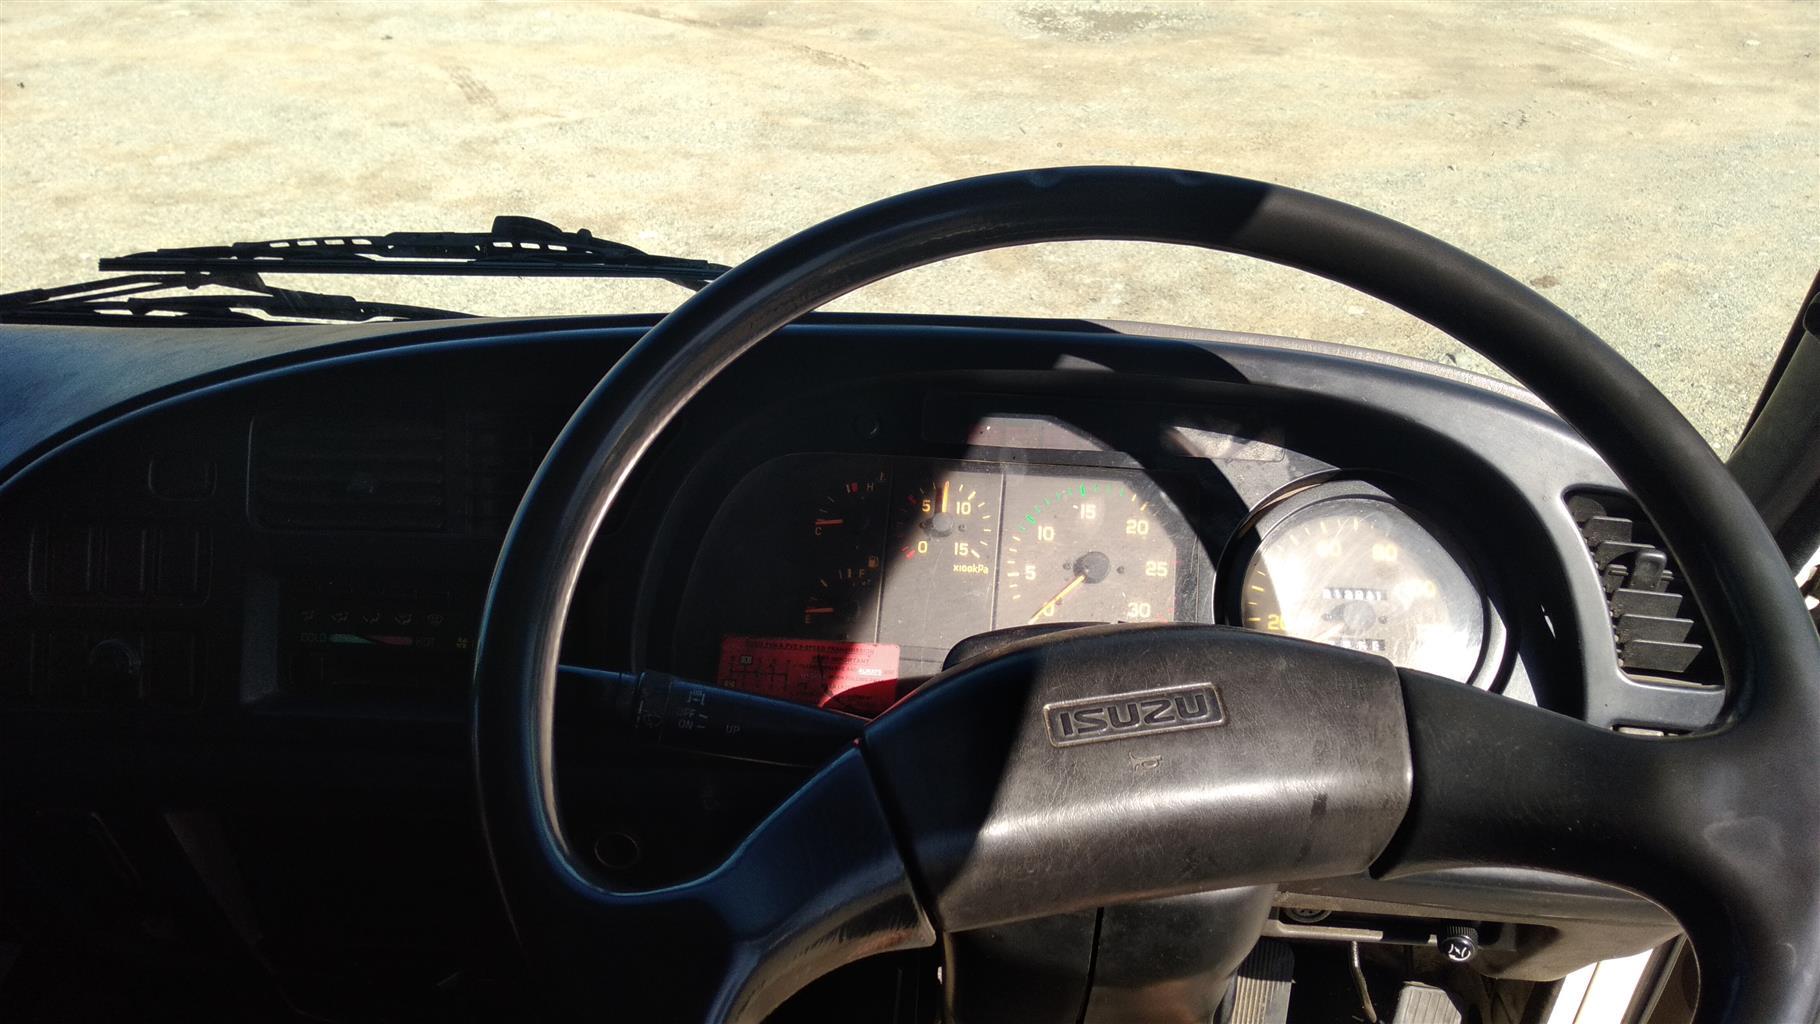 Isuzu 800 Freighter Turbo